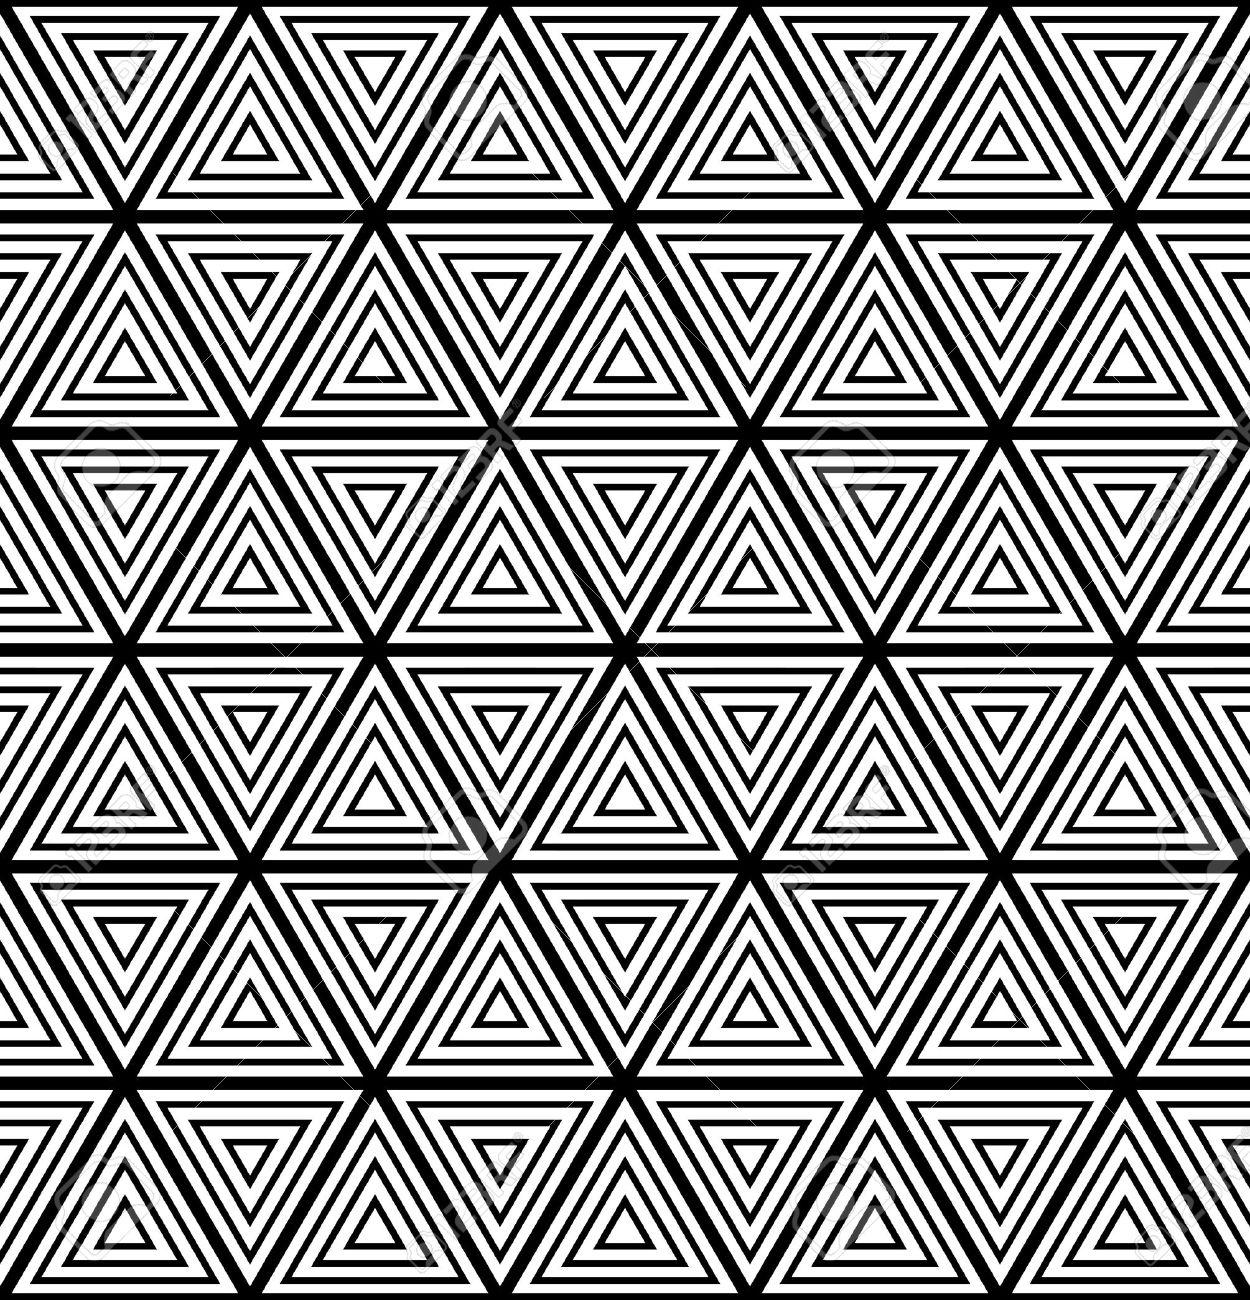 Seamless geometric pattern. Vector art. - 17441568